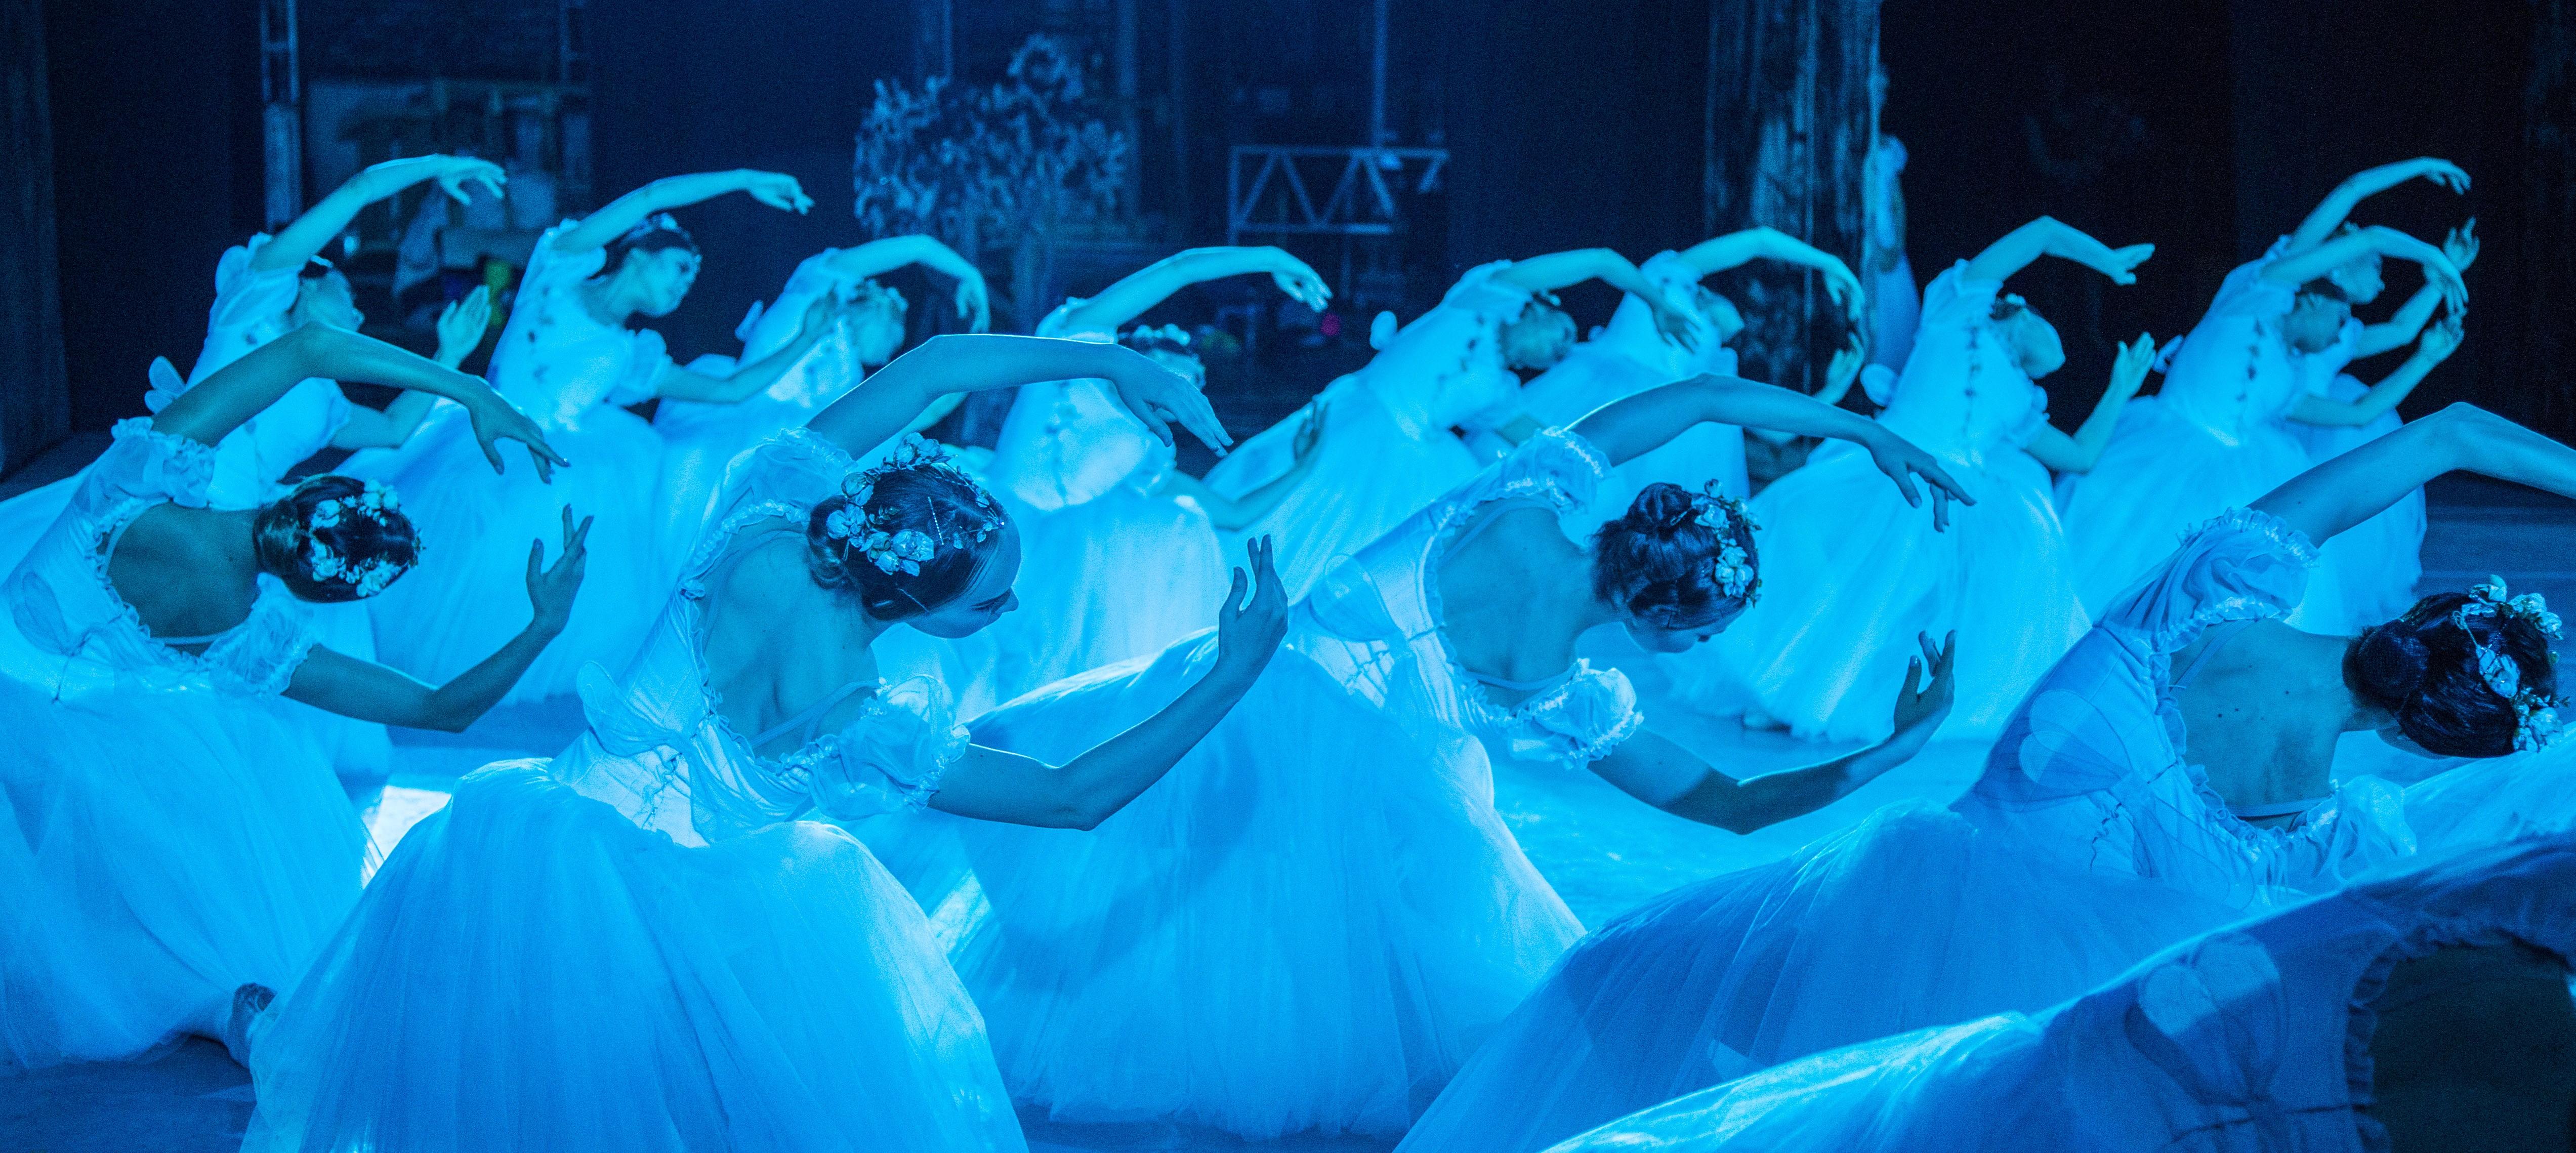 В Астрахани  проходит программа Международного культурного центра